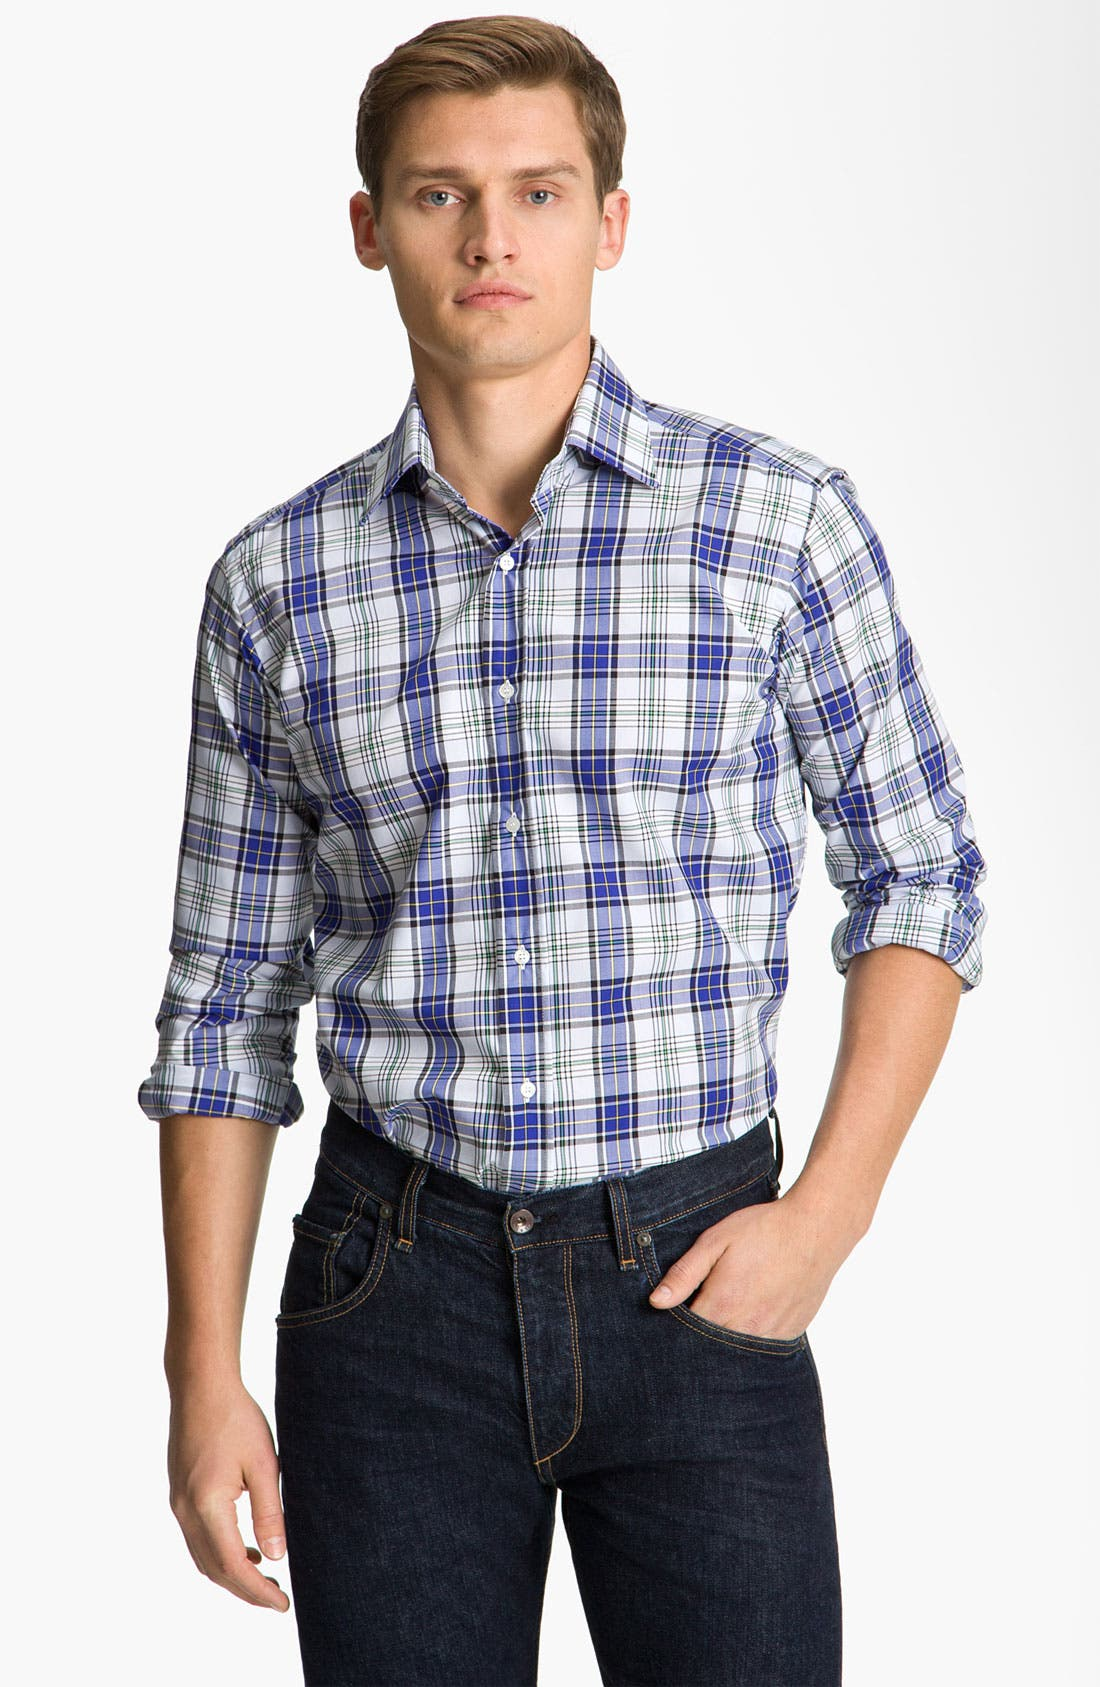 Alternate Image 1 Selected - Etro Check Plaid Shirt